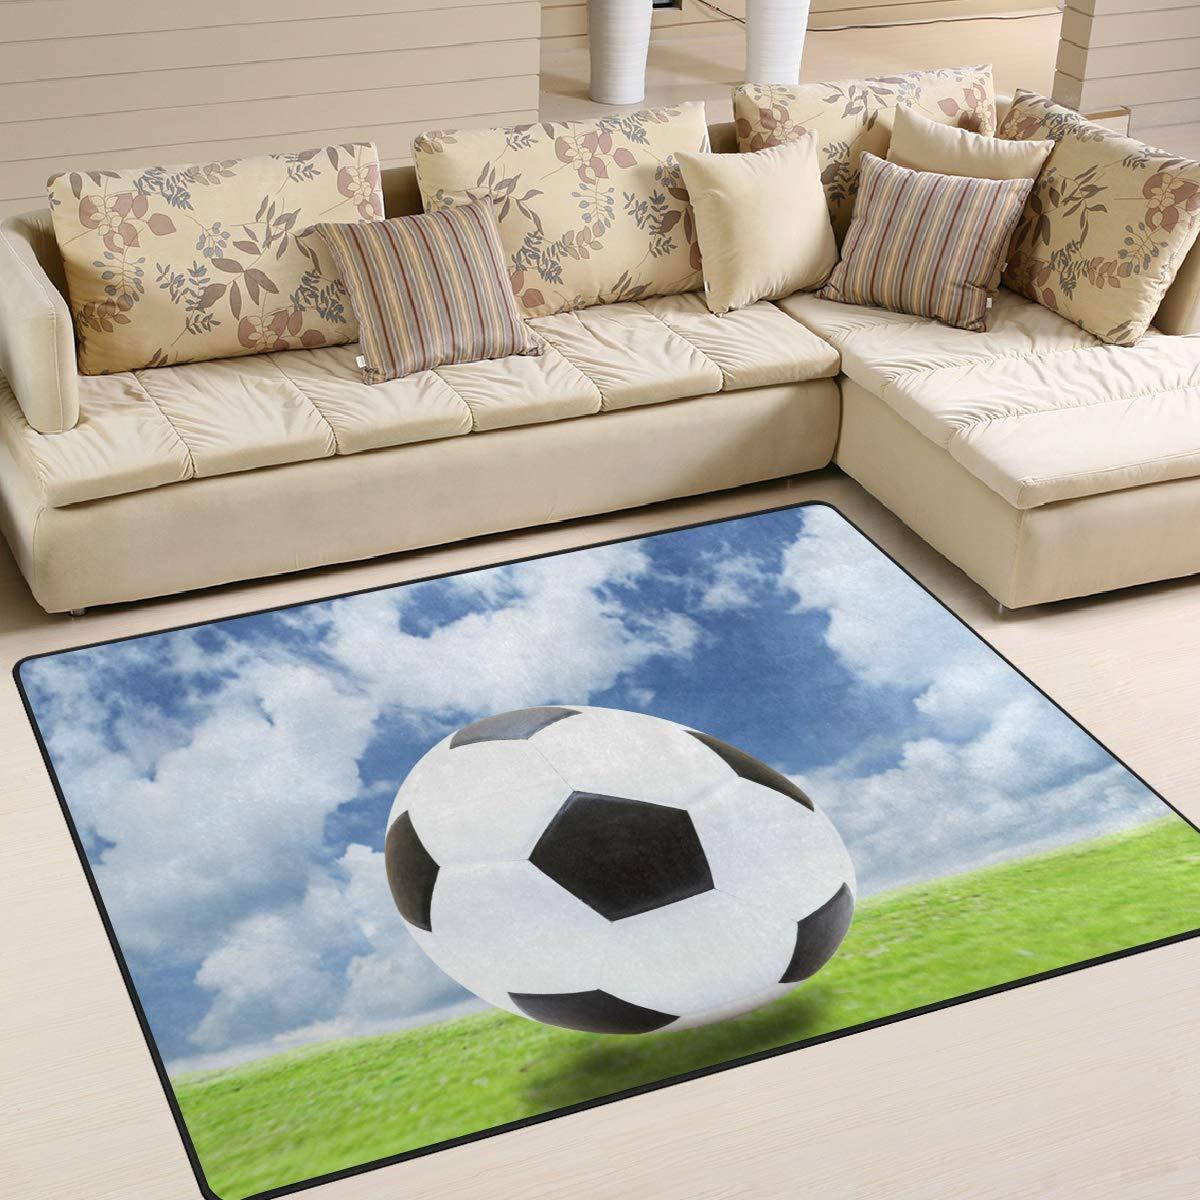 Use7 - Alfombra para Sala de Estar, Dormitorio, diseño de balón de ...